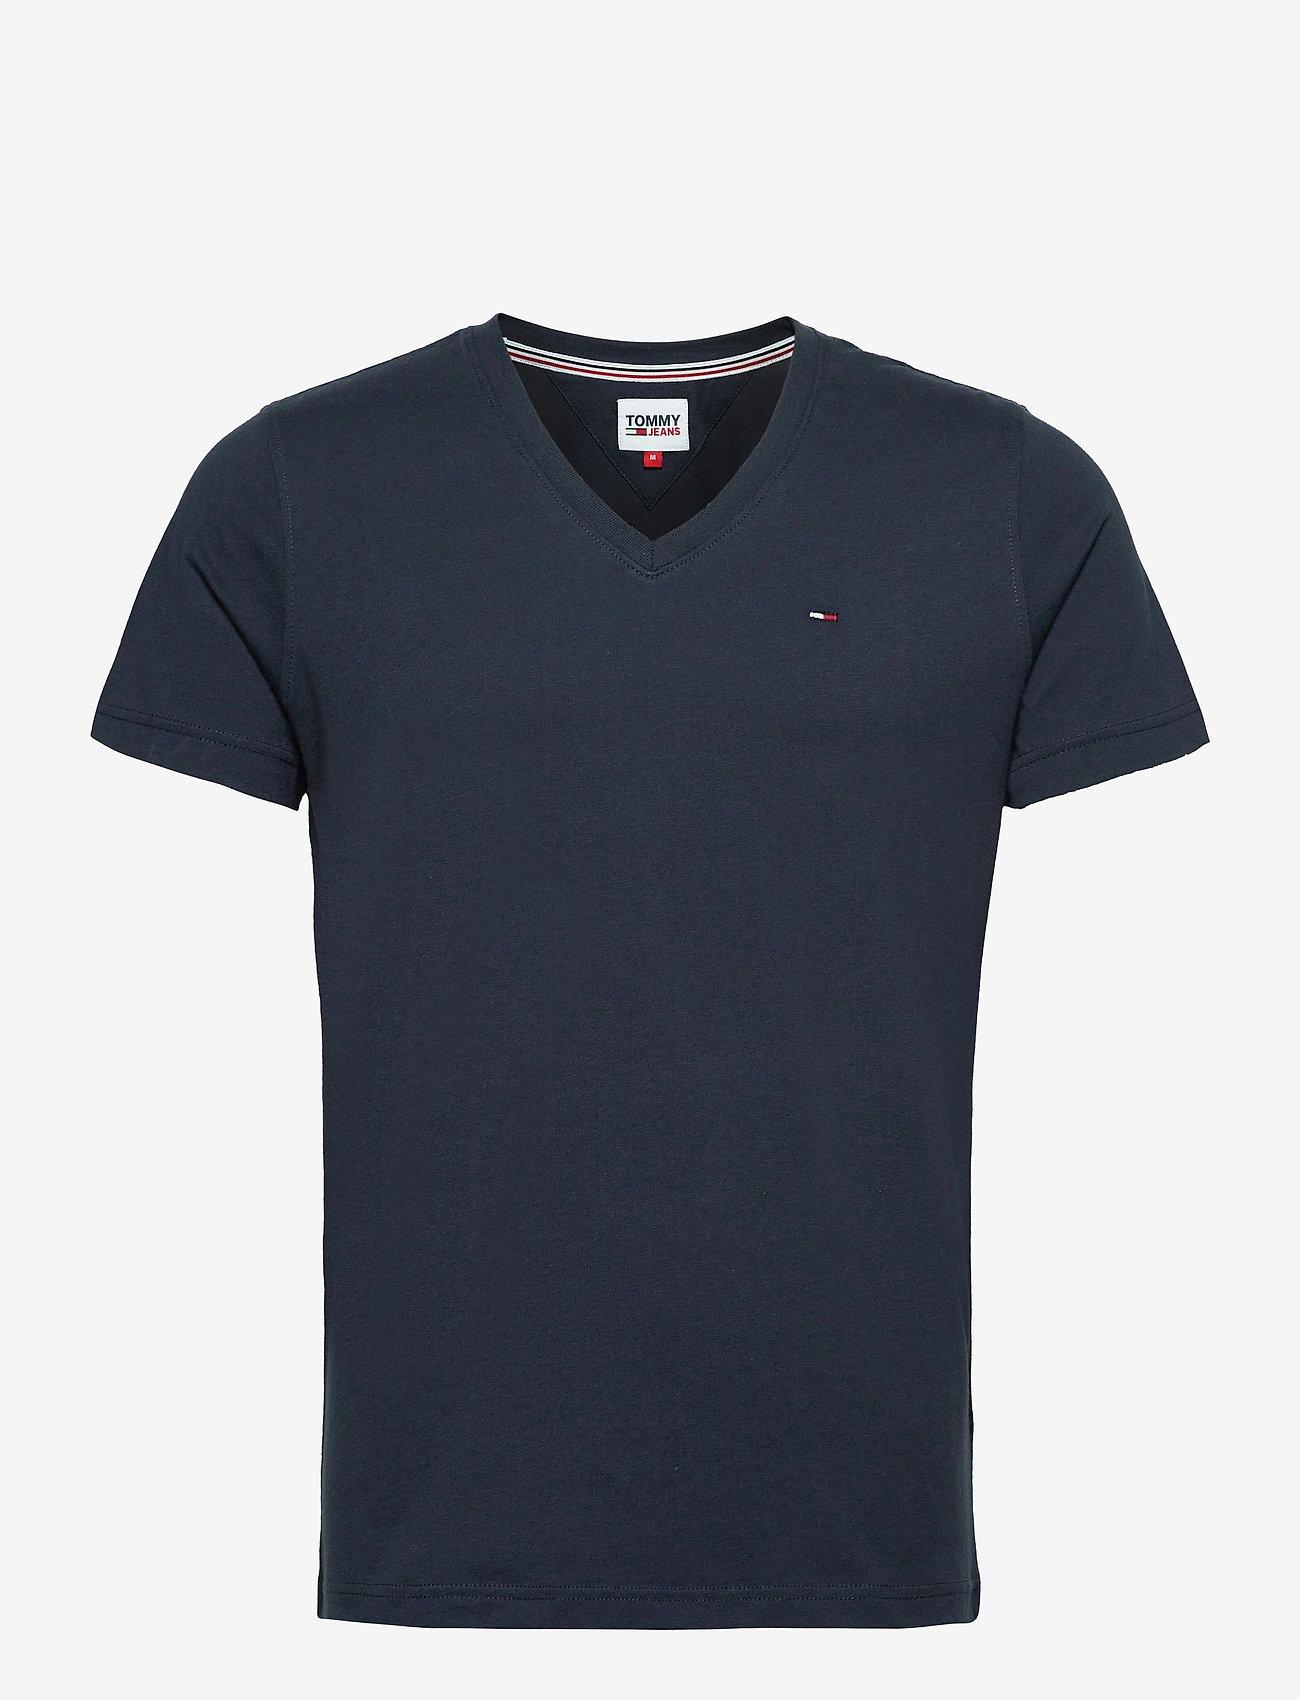 Tommy Jeans - TJM ORIGINAL JERSEY V NECK TEE - basic t-shirts - black iris - 0